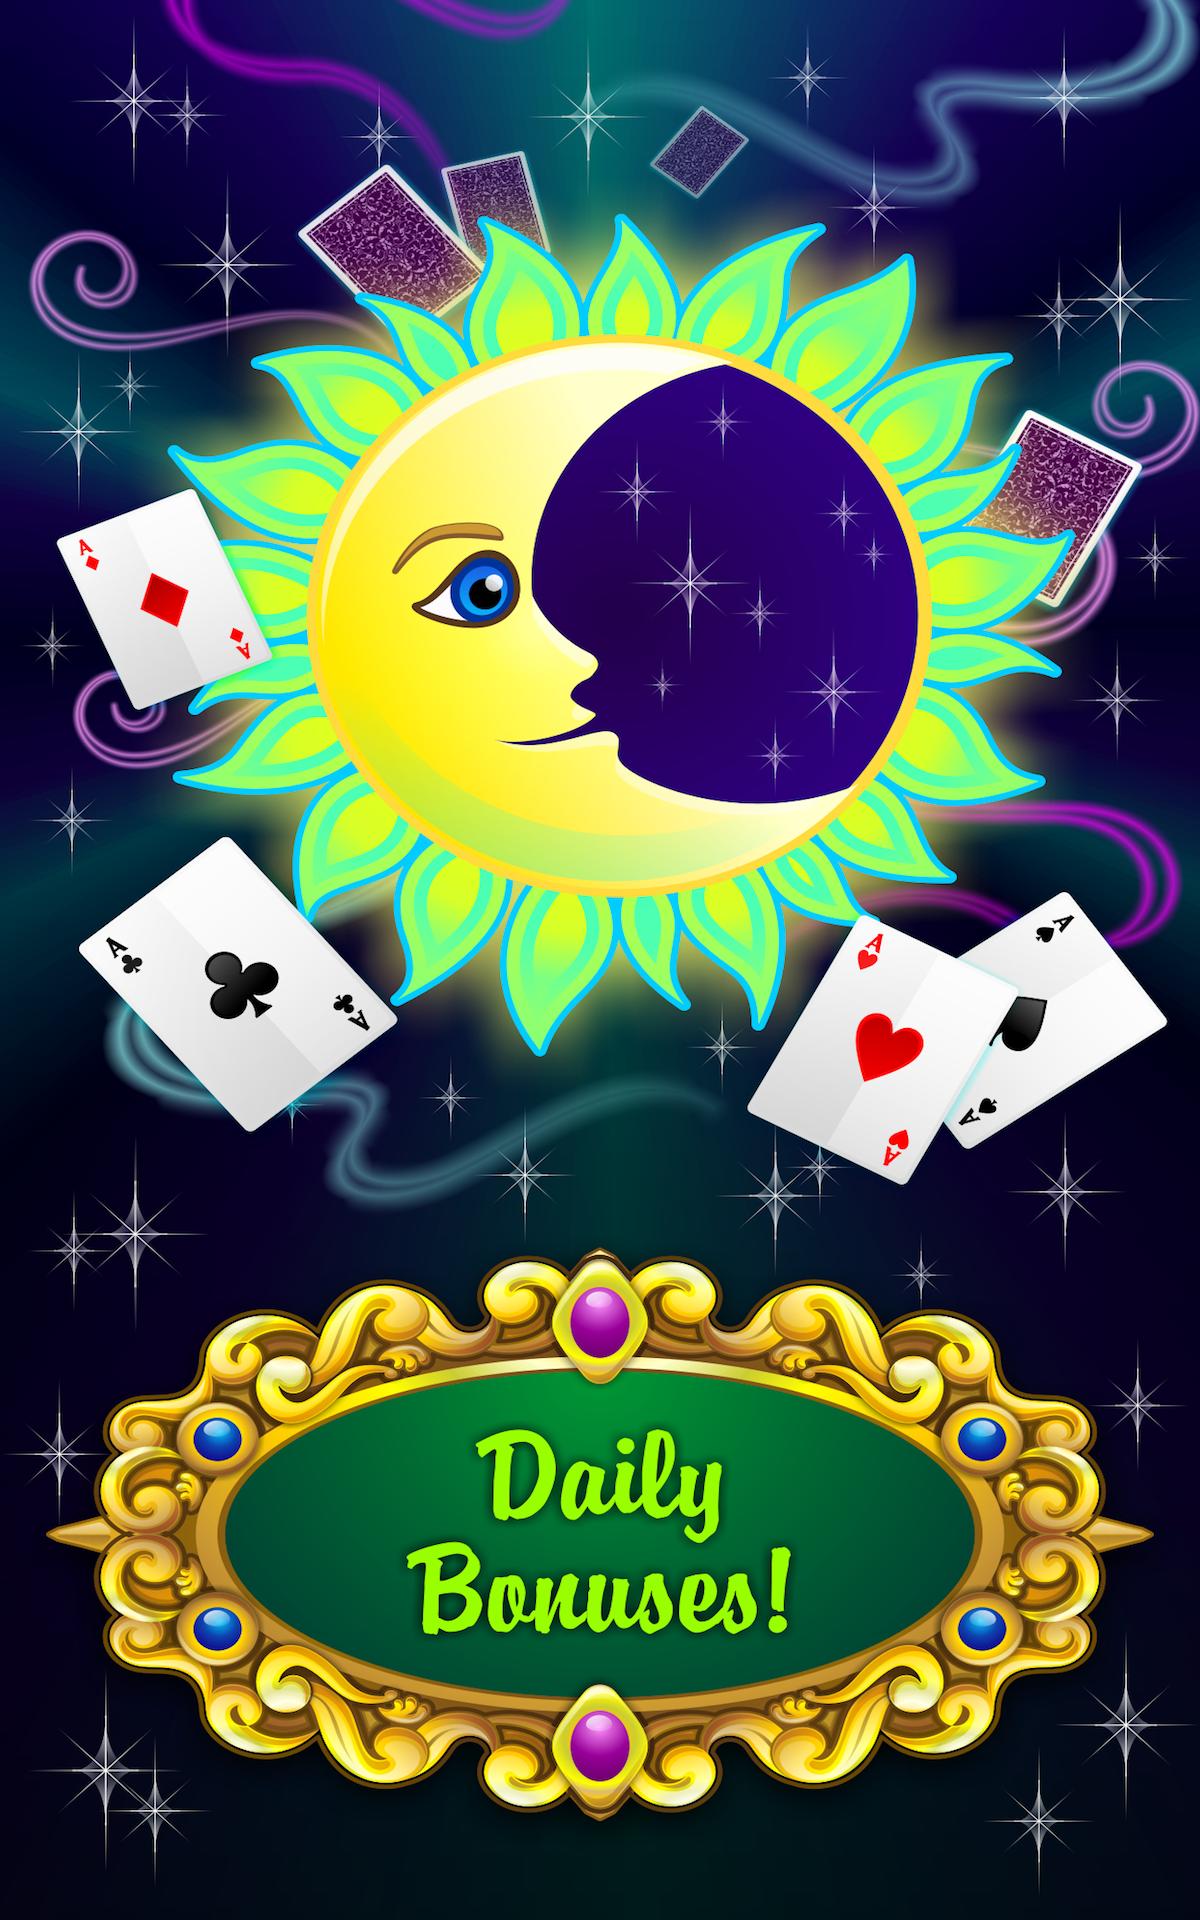 Tiradas gratis fortune teller slots vegas casino free coins 422558